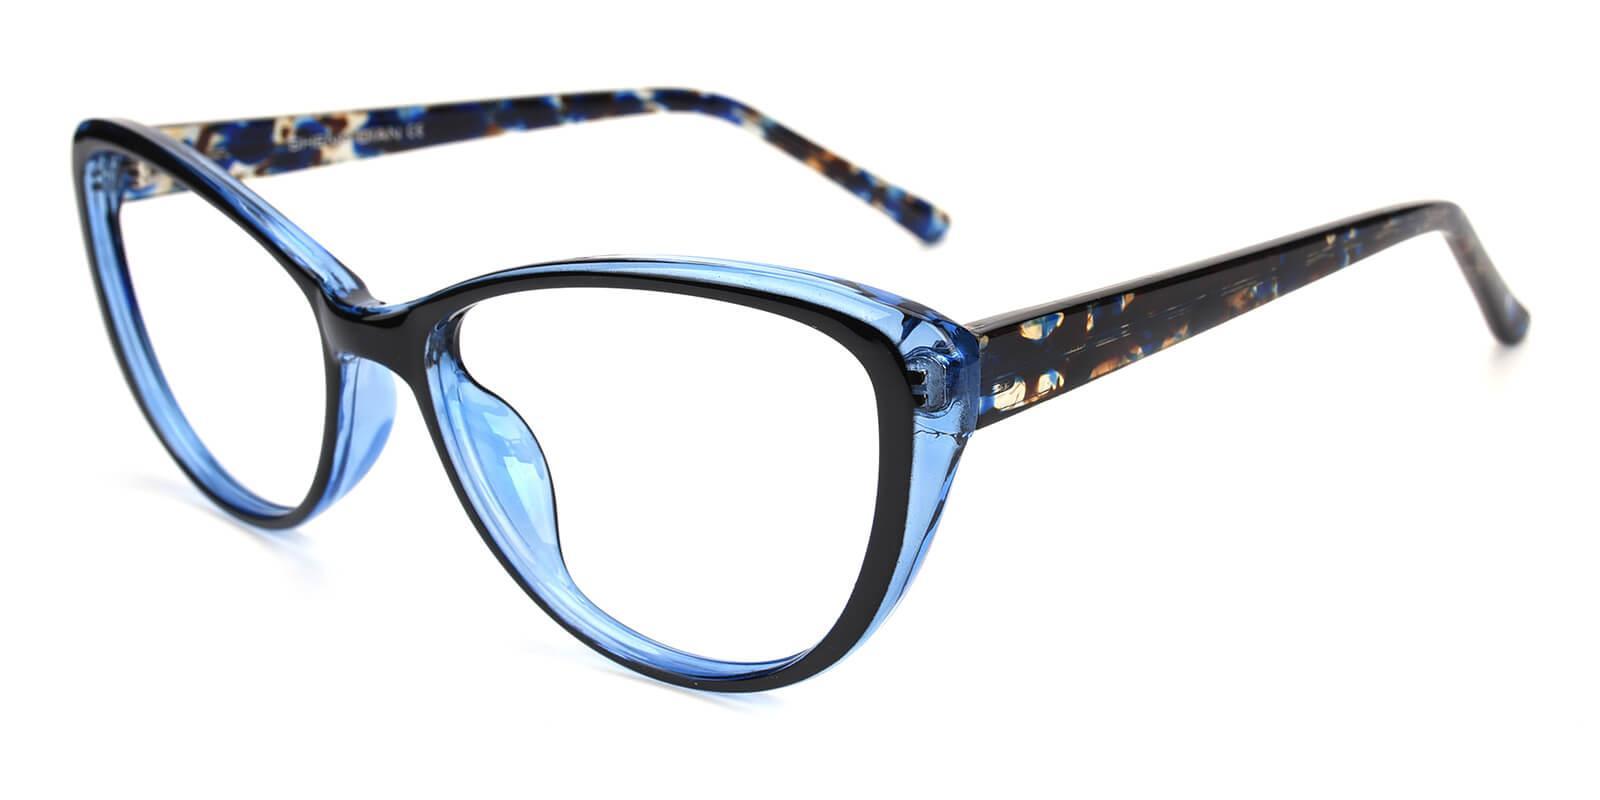 Slackey-Blue-Oval / Cat-Acetate-Eyeglasses-additional1